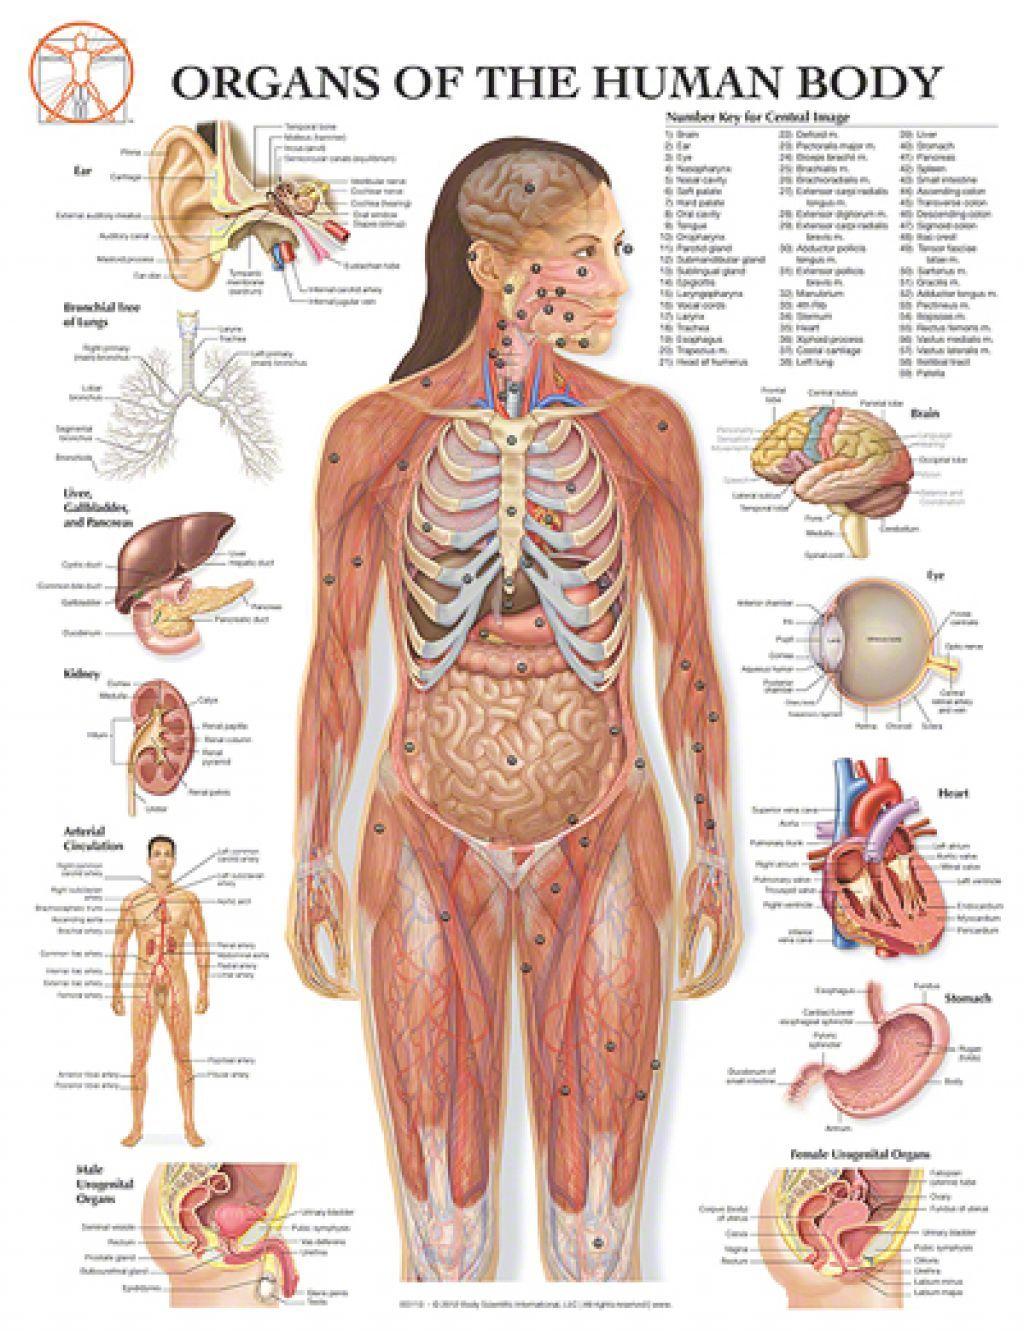 hight resolution of female human body diagram of organs projects to try human body human body diagram female body organs diagram female